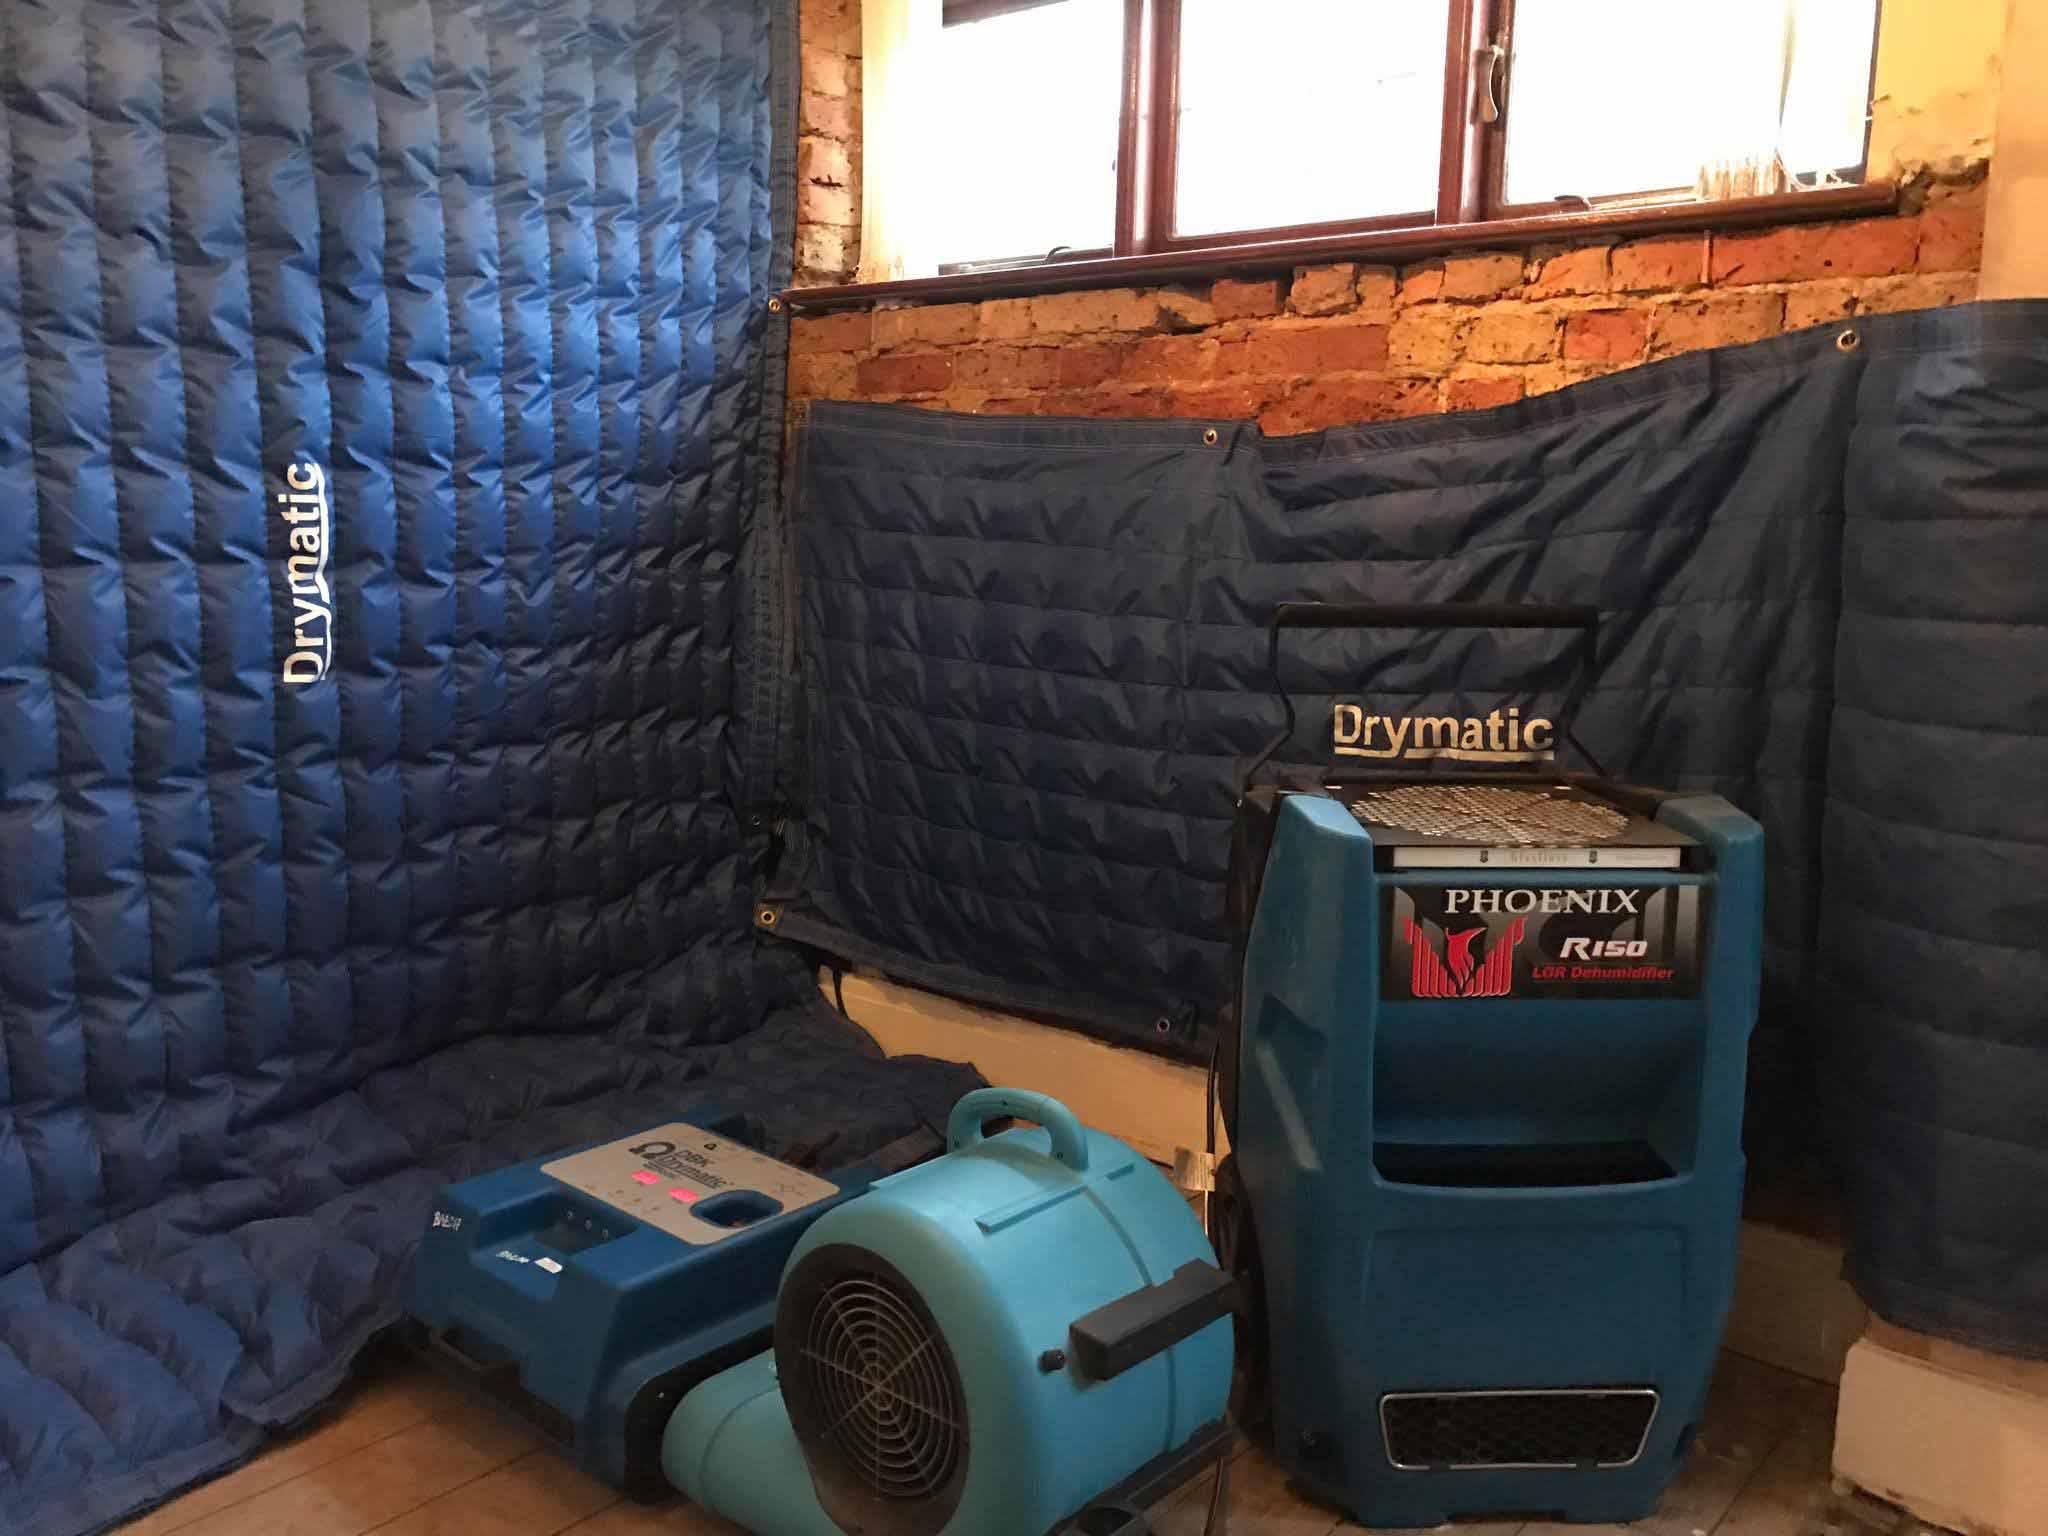 Drymatic Wall Mats27.jpg